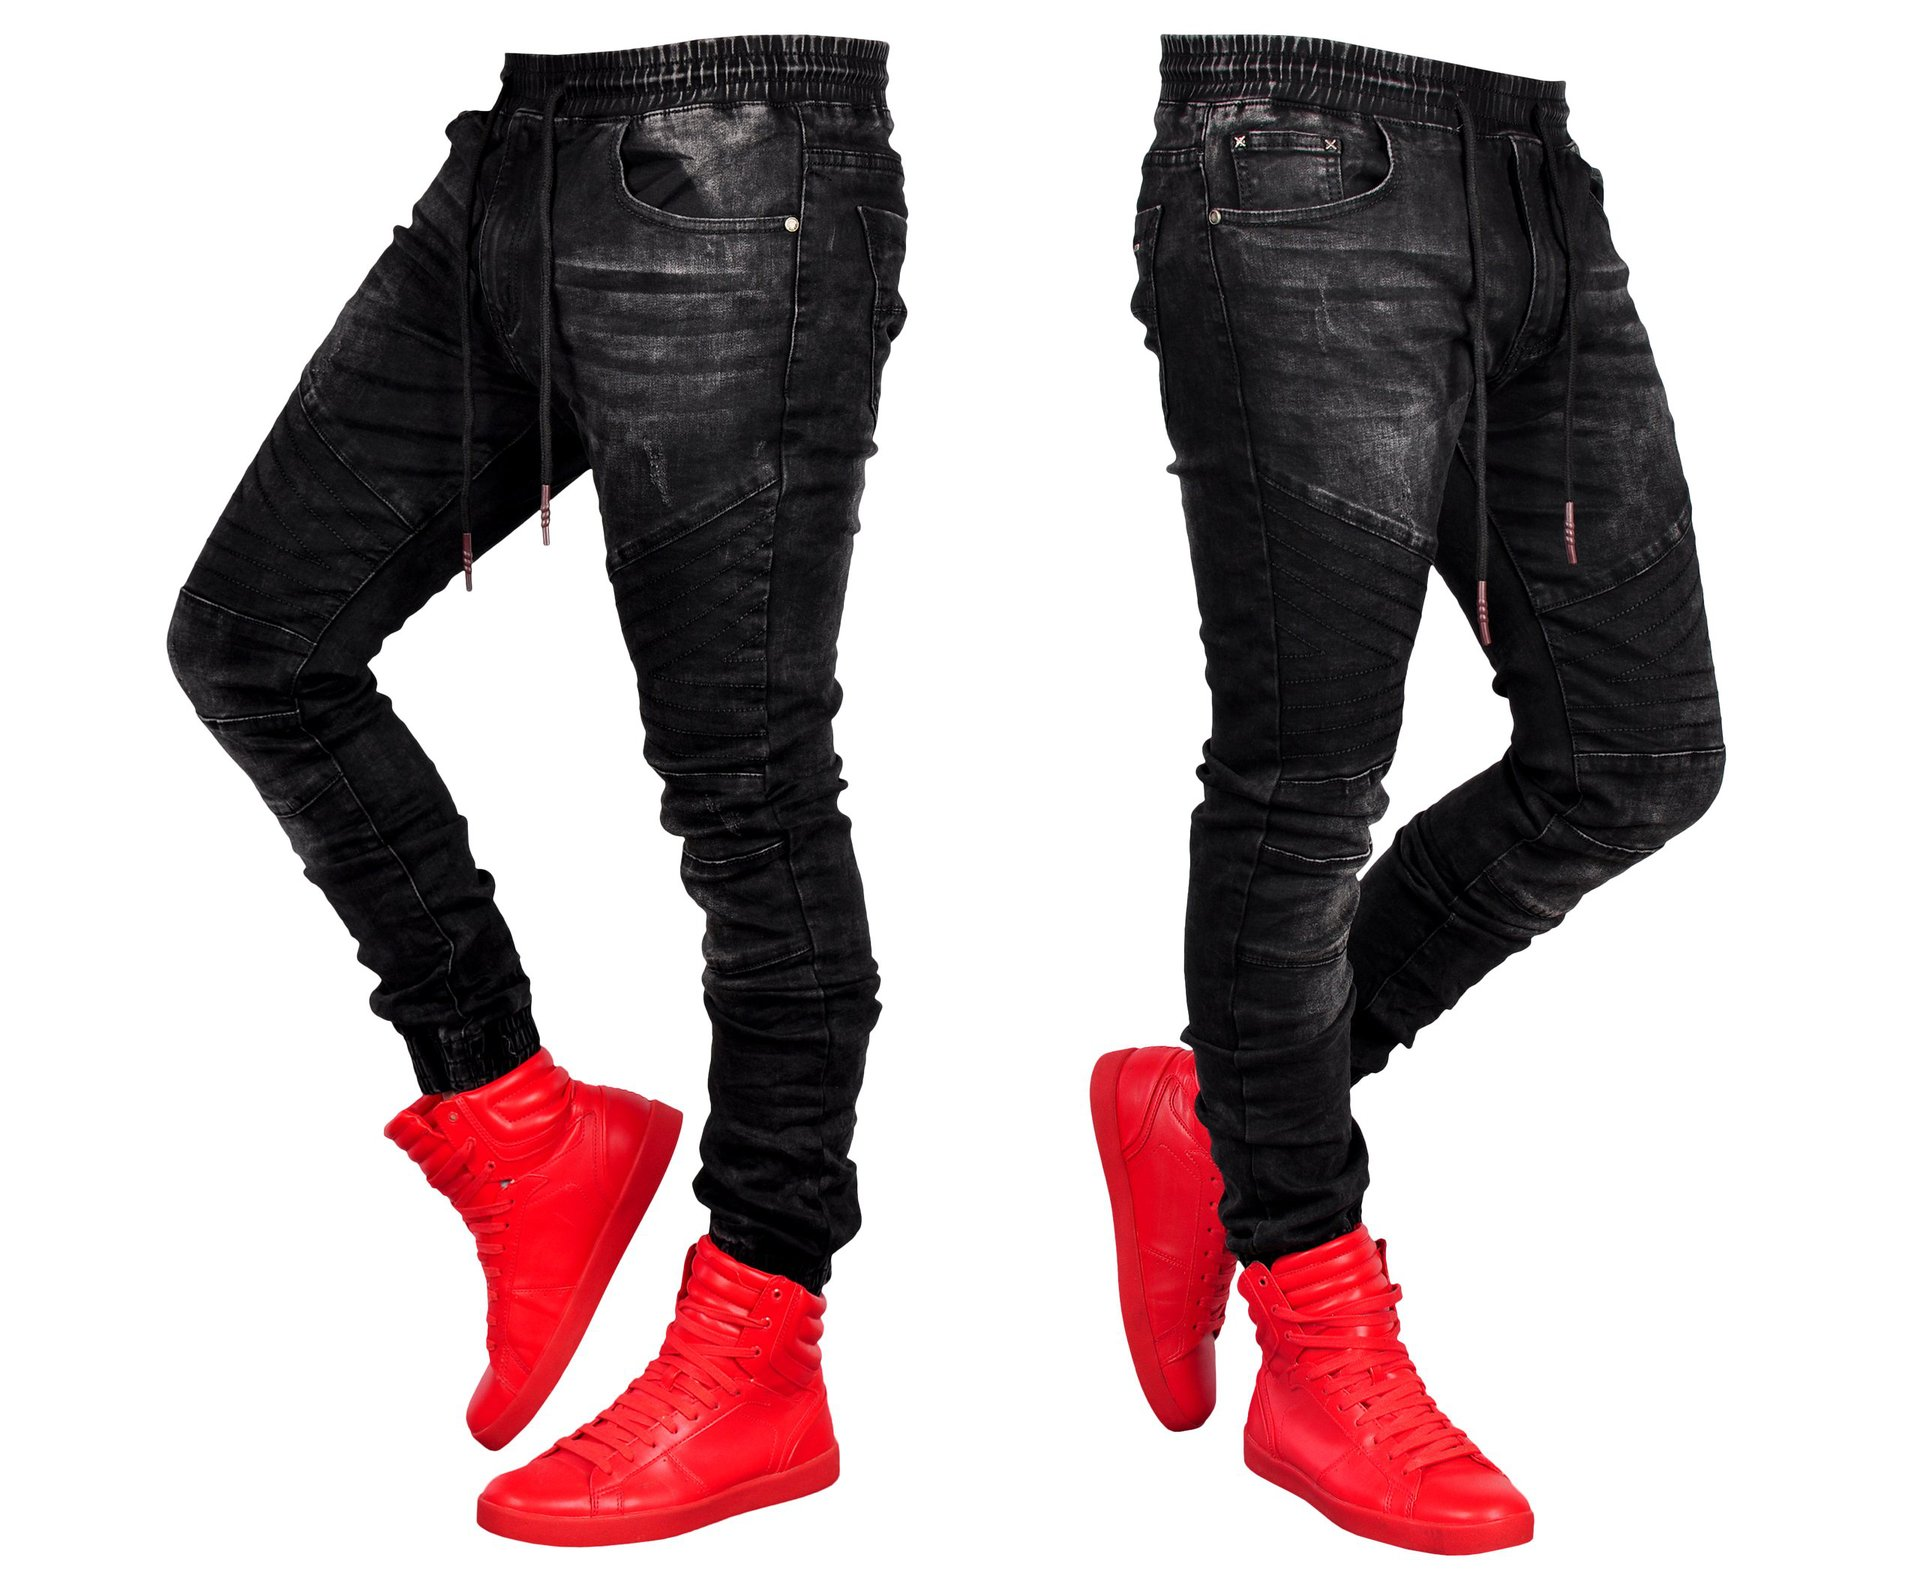 New Ripped Jeans For Men Slim Biker Zipper Denim Jeans Skinny Frayed Pants Distressed Rip Trousers Black Jeans Drop Shipping